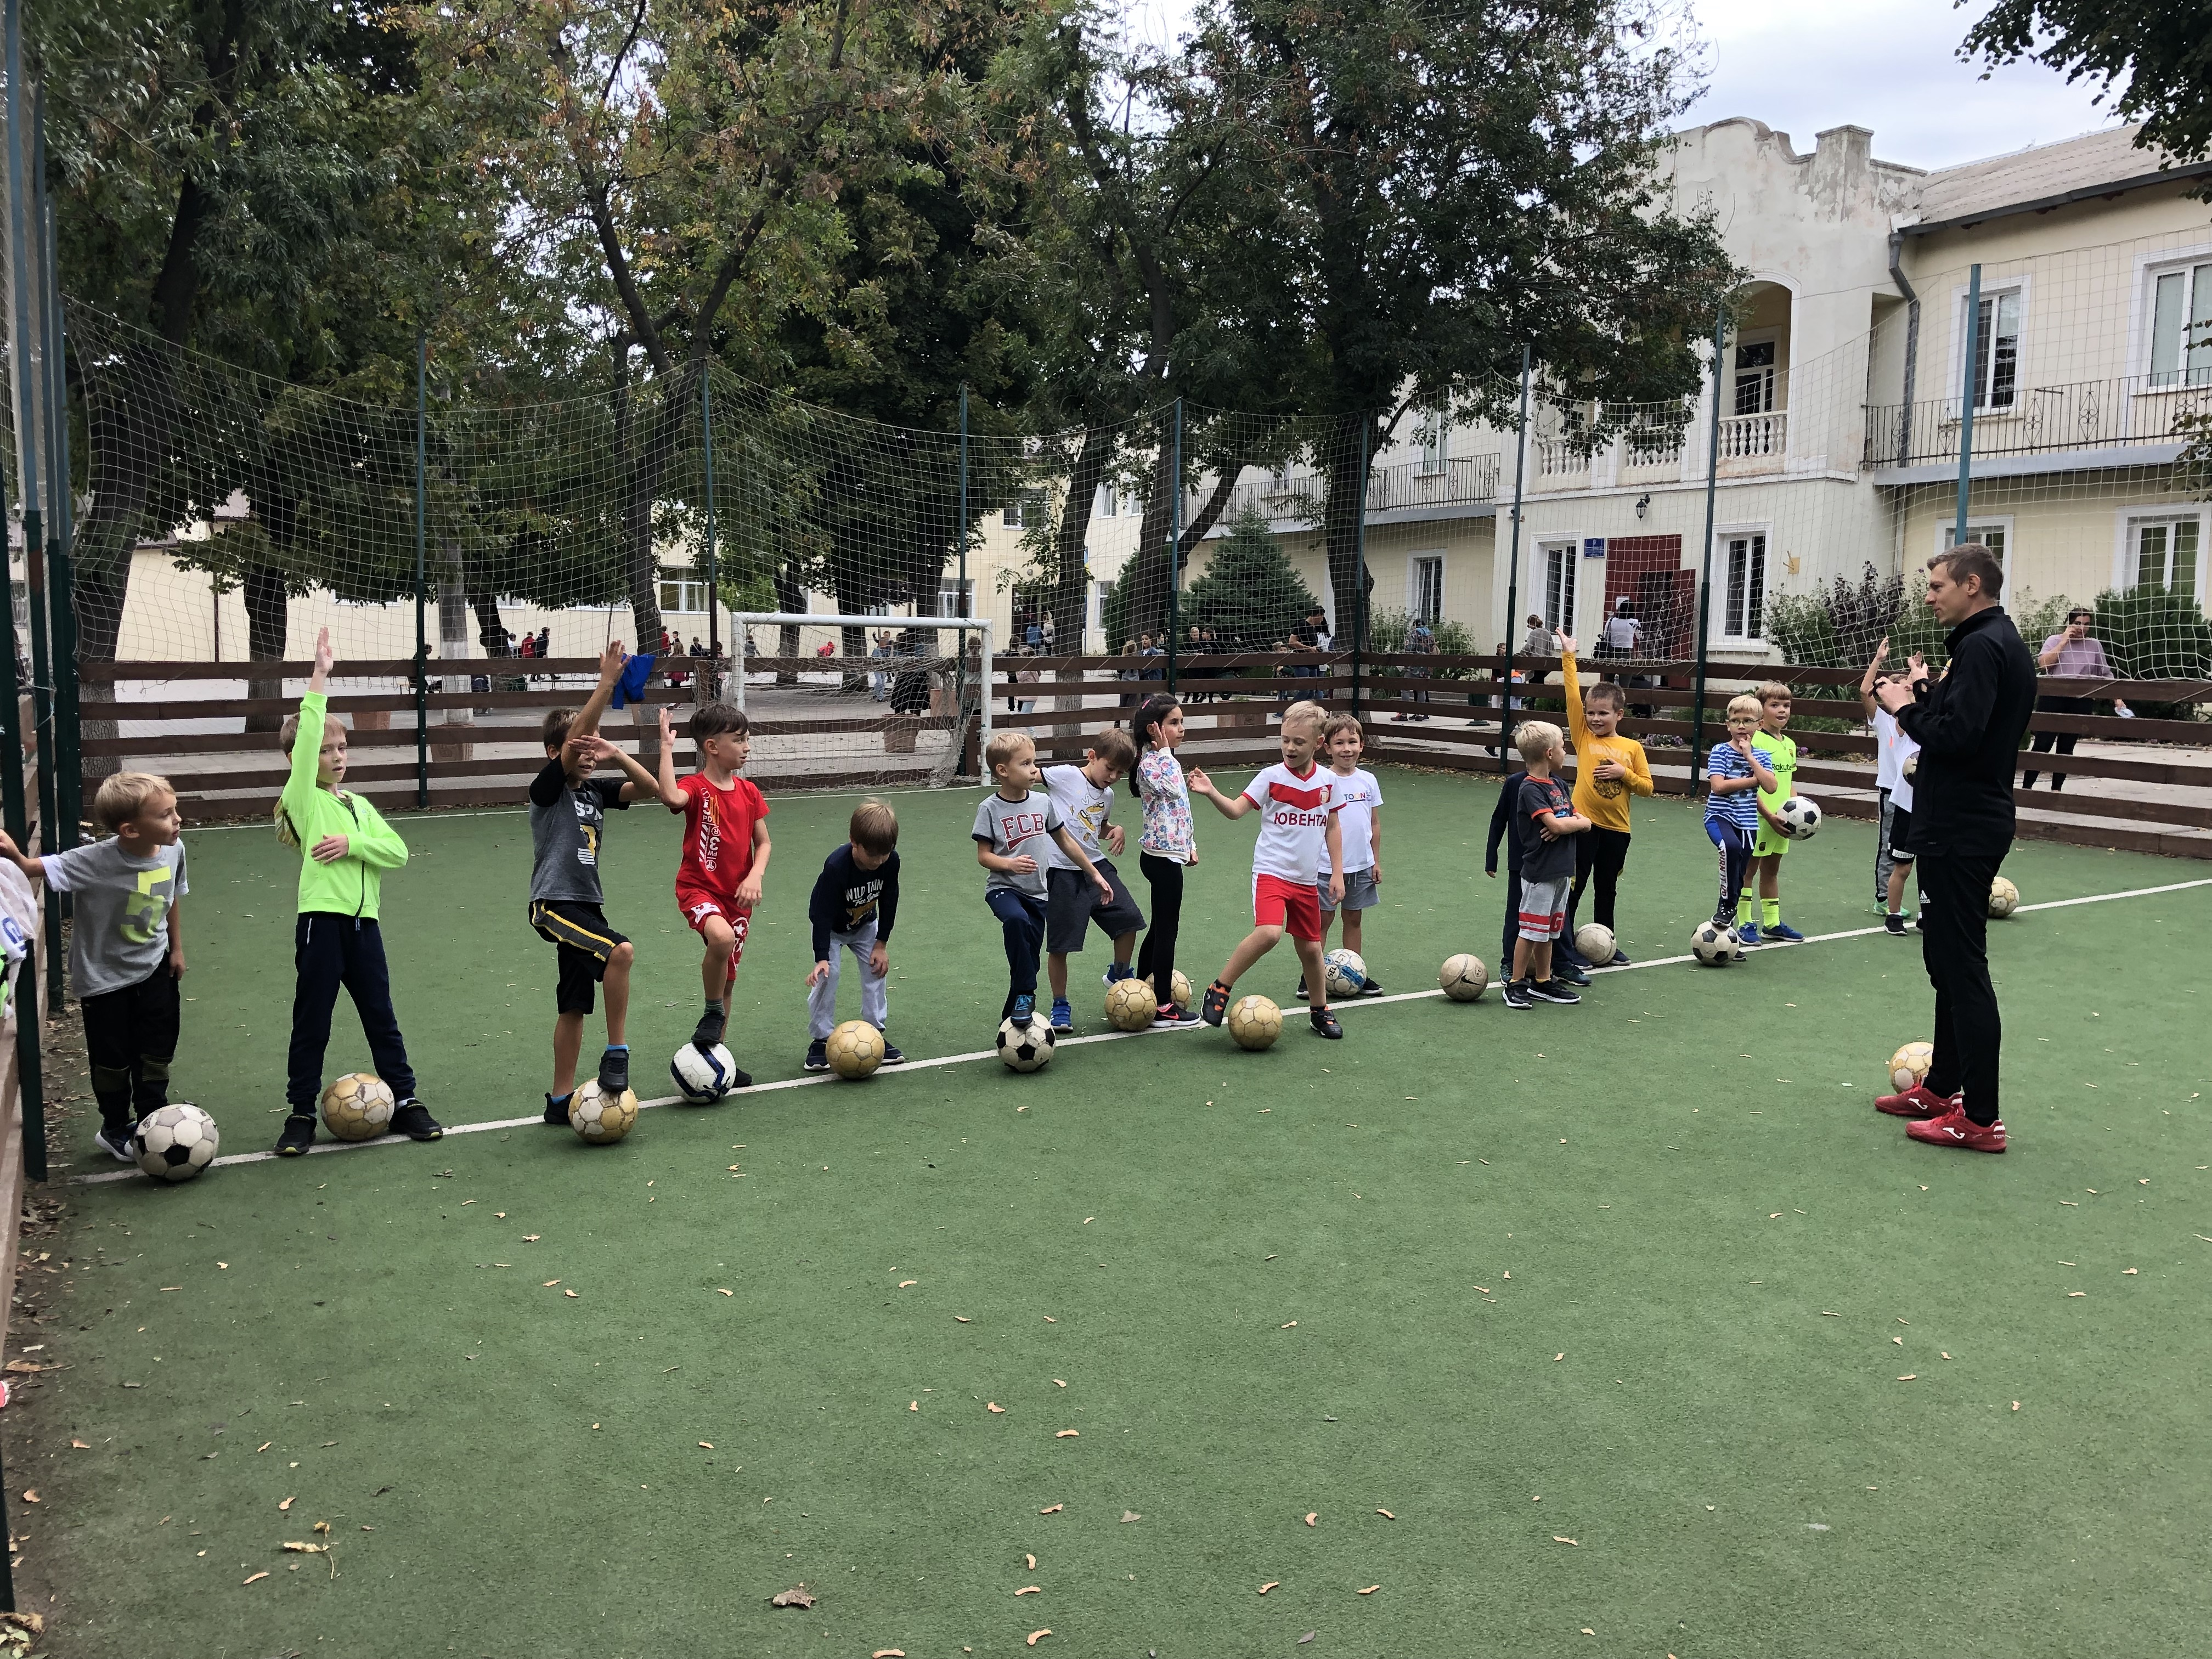 мини-футбол, детский спорт, детский футбол, любительский футбол